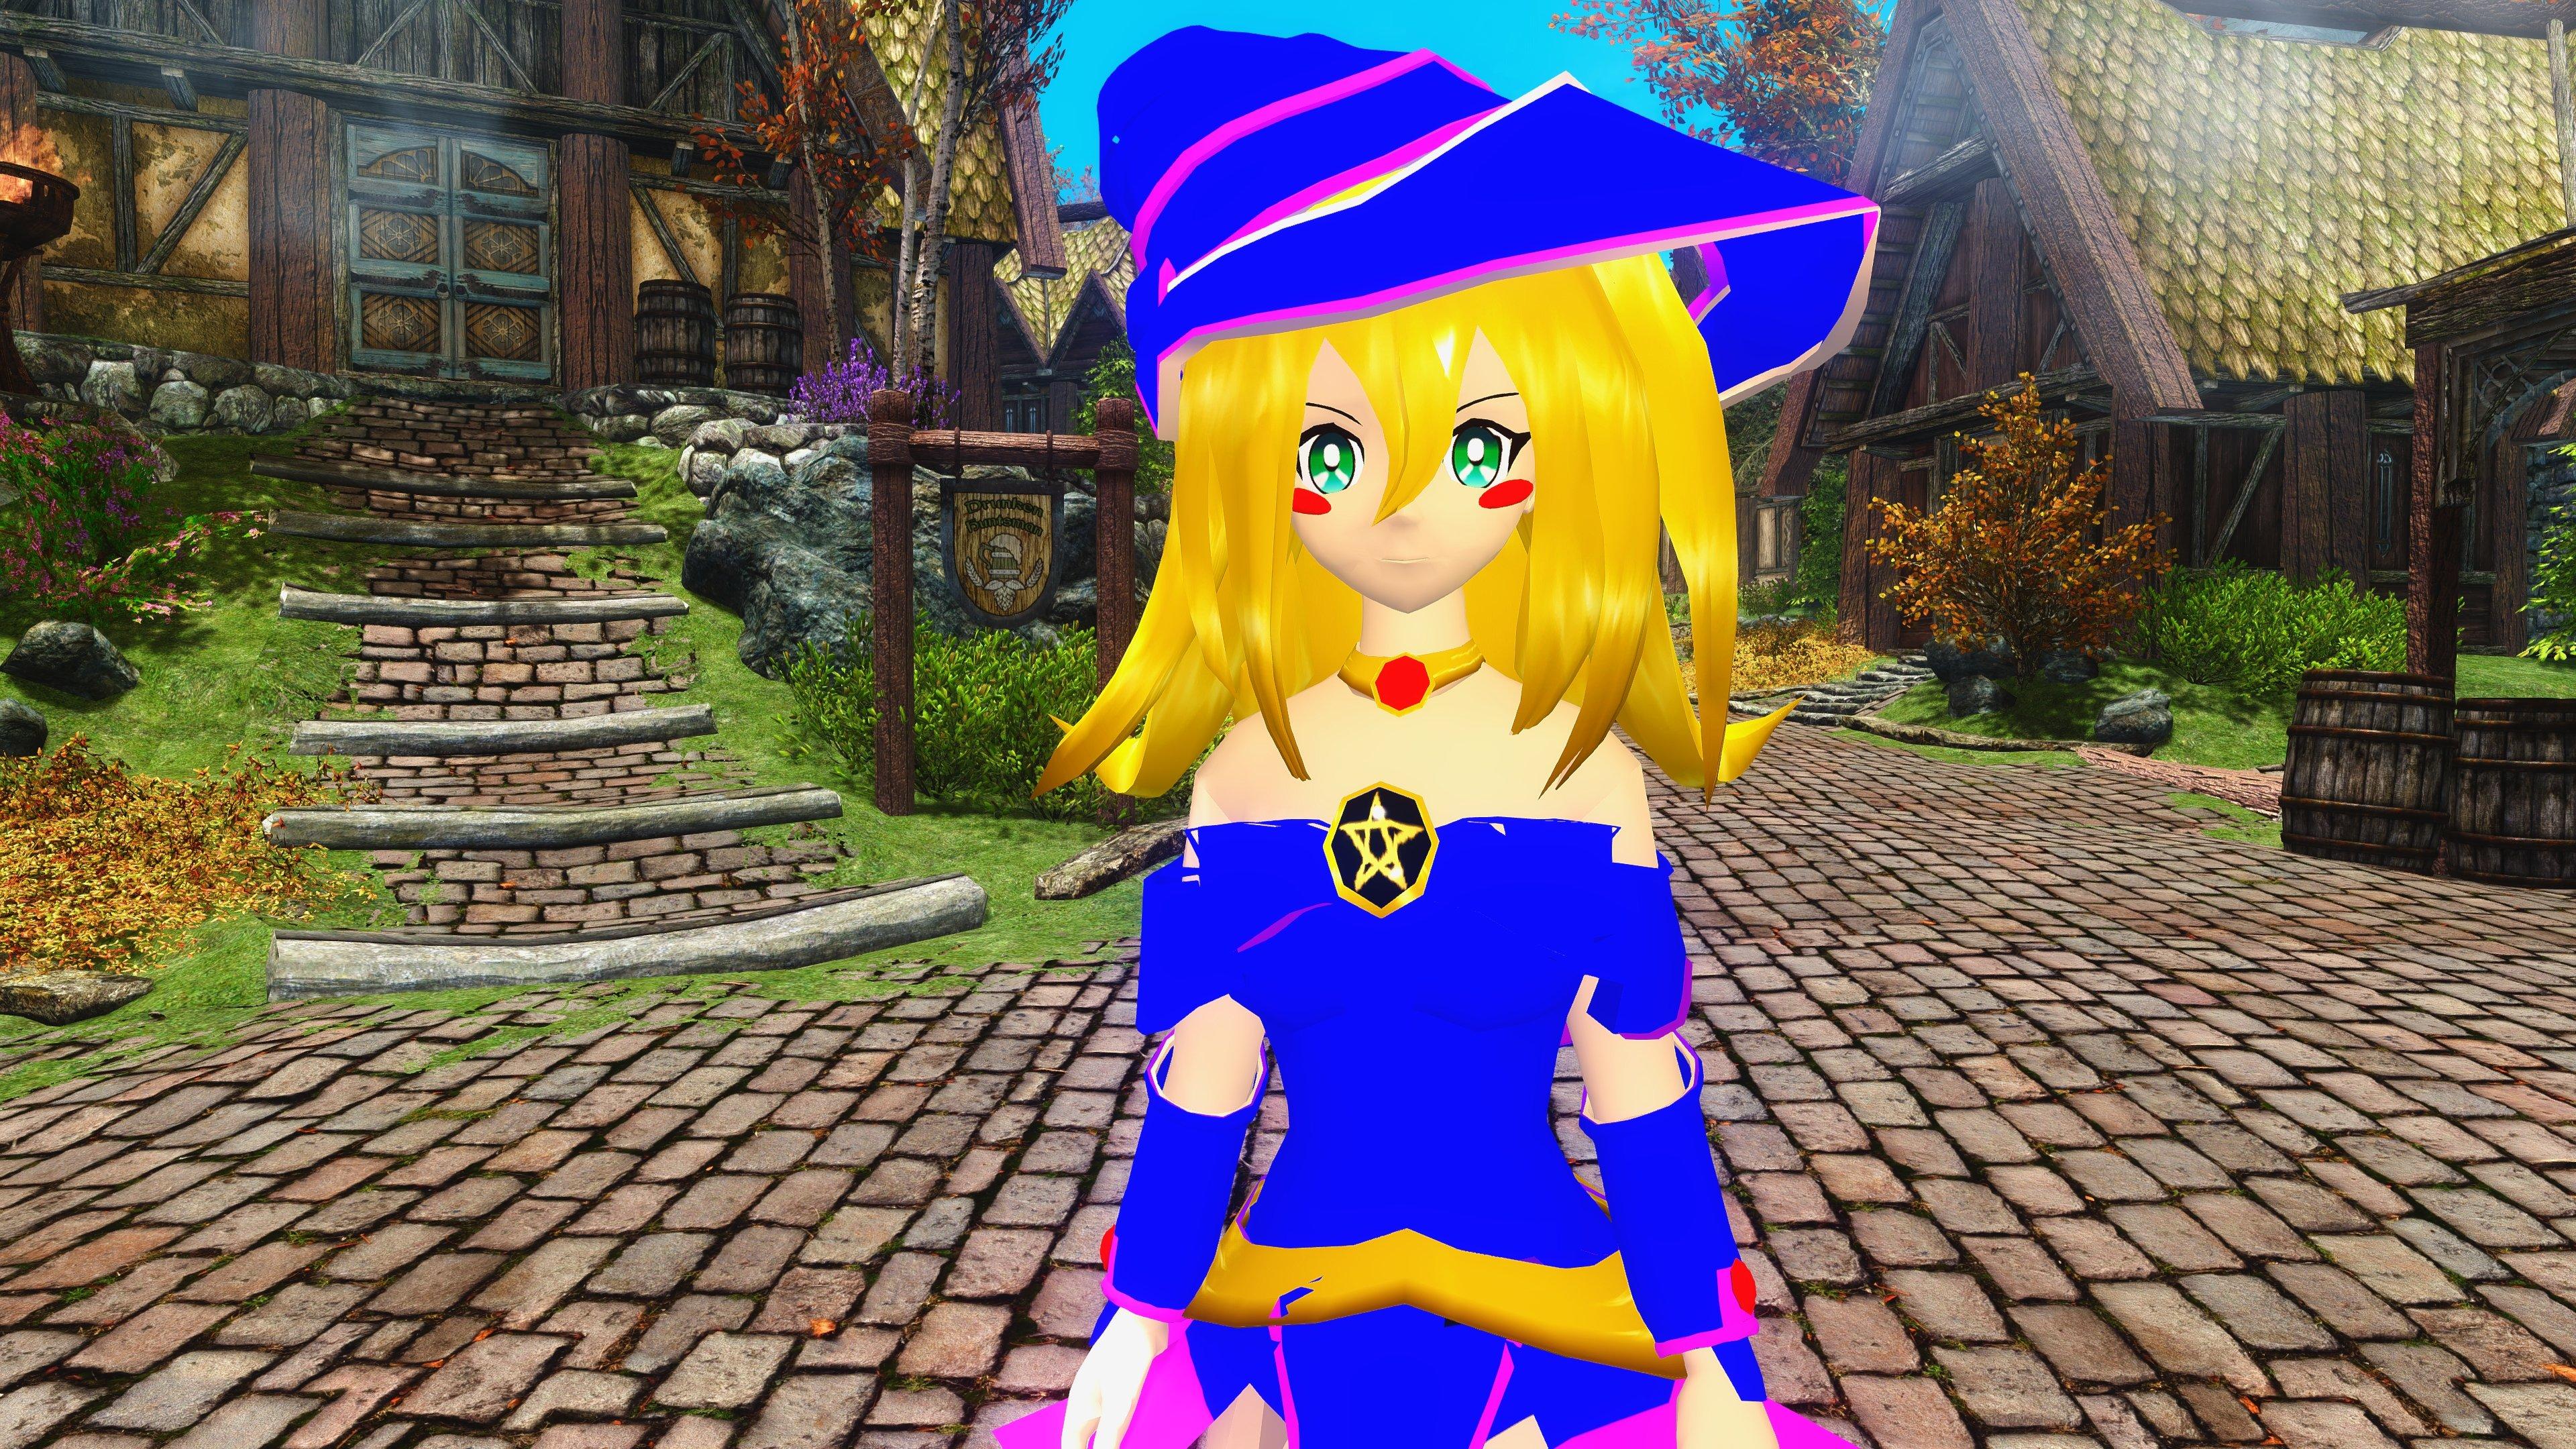 Dark Magician Girl Wallpapers 3840x2160 Ultra Hd 4k Desktop